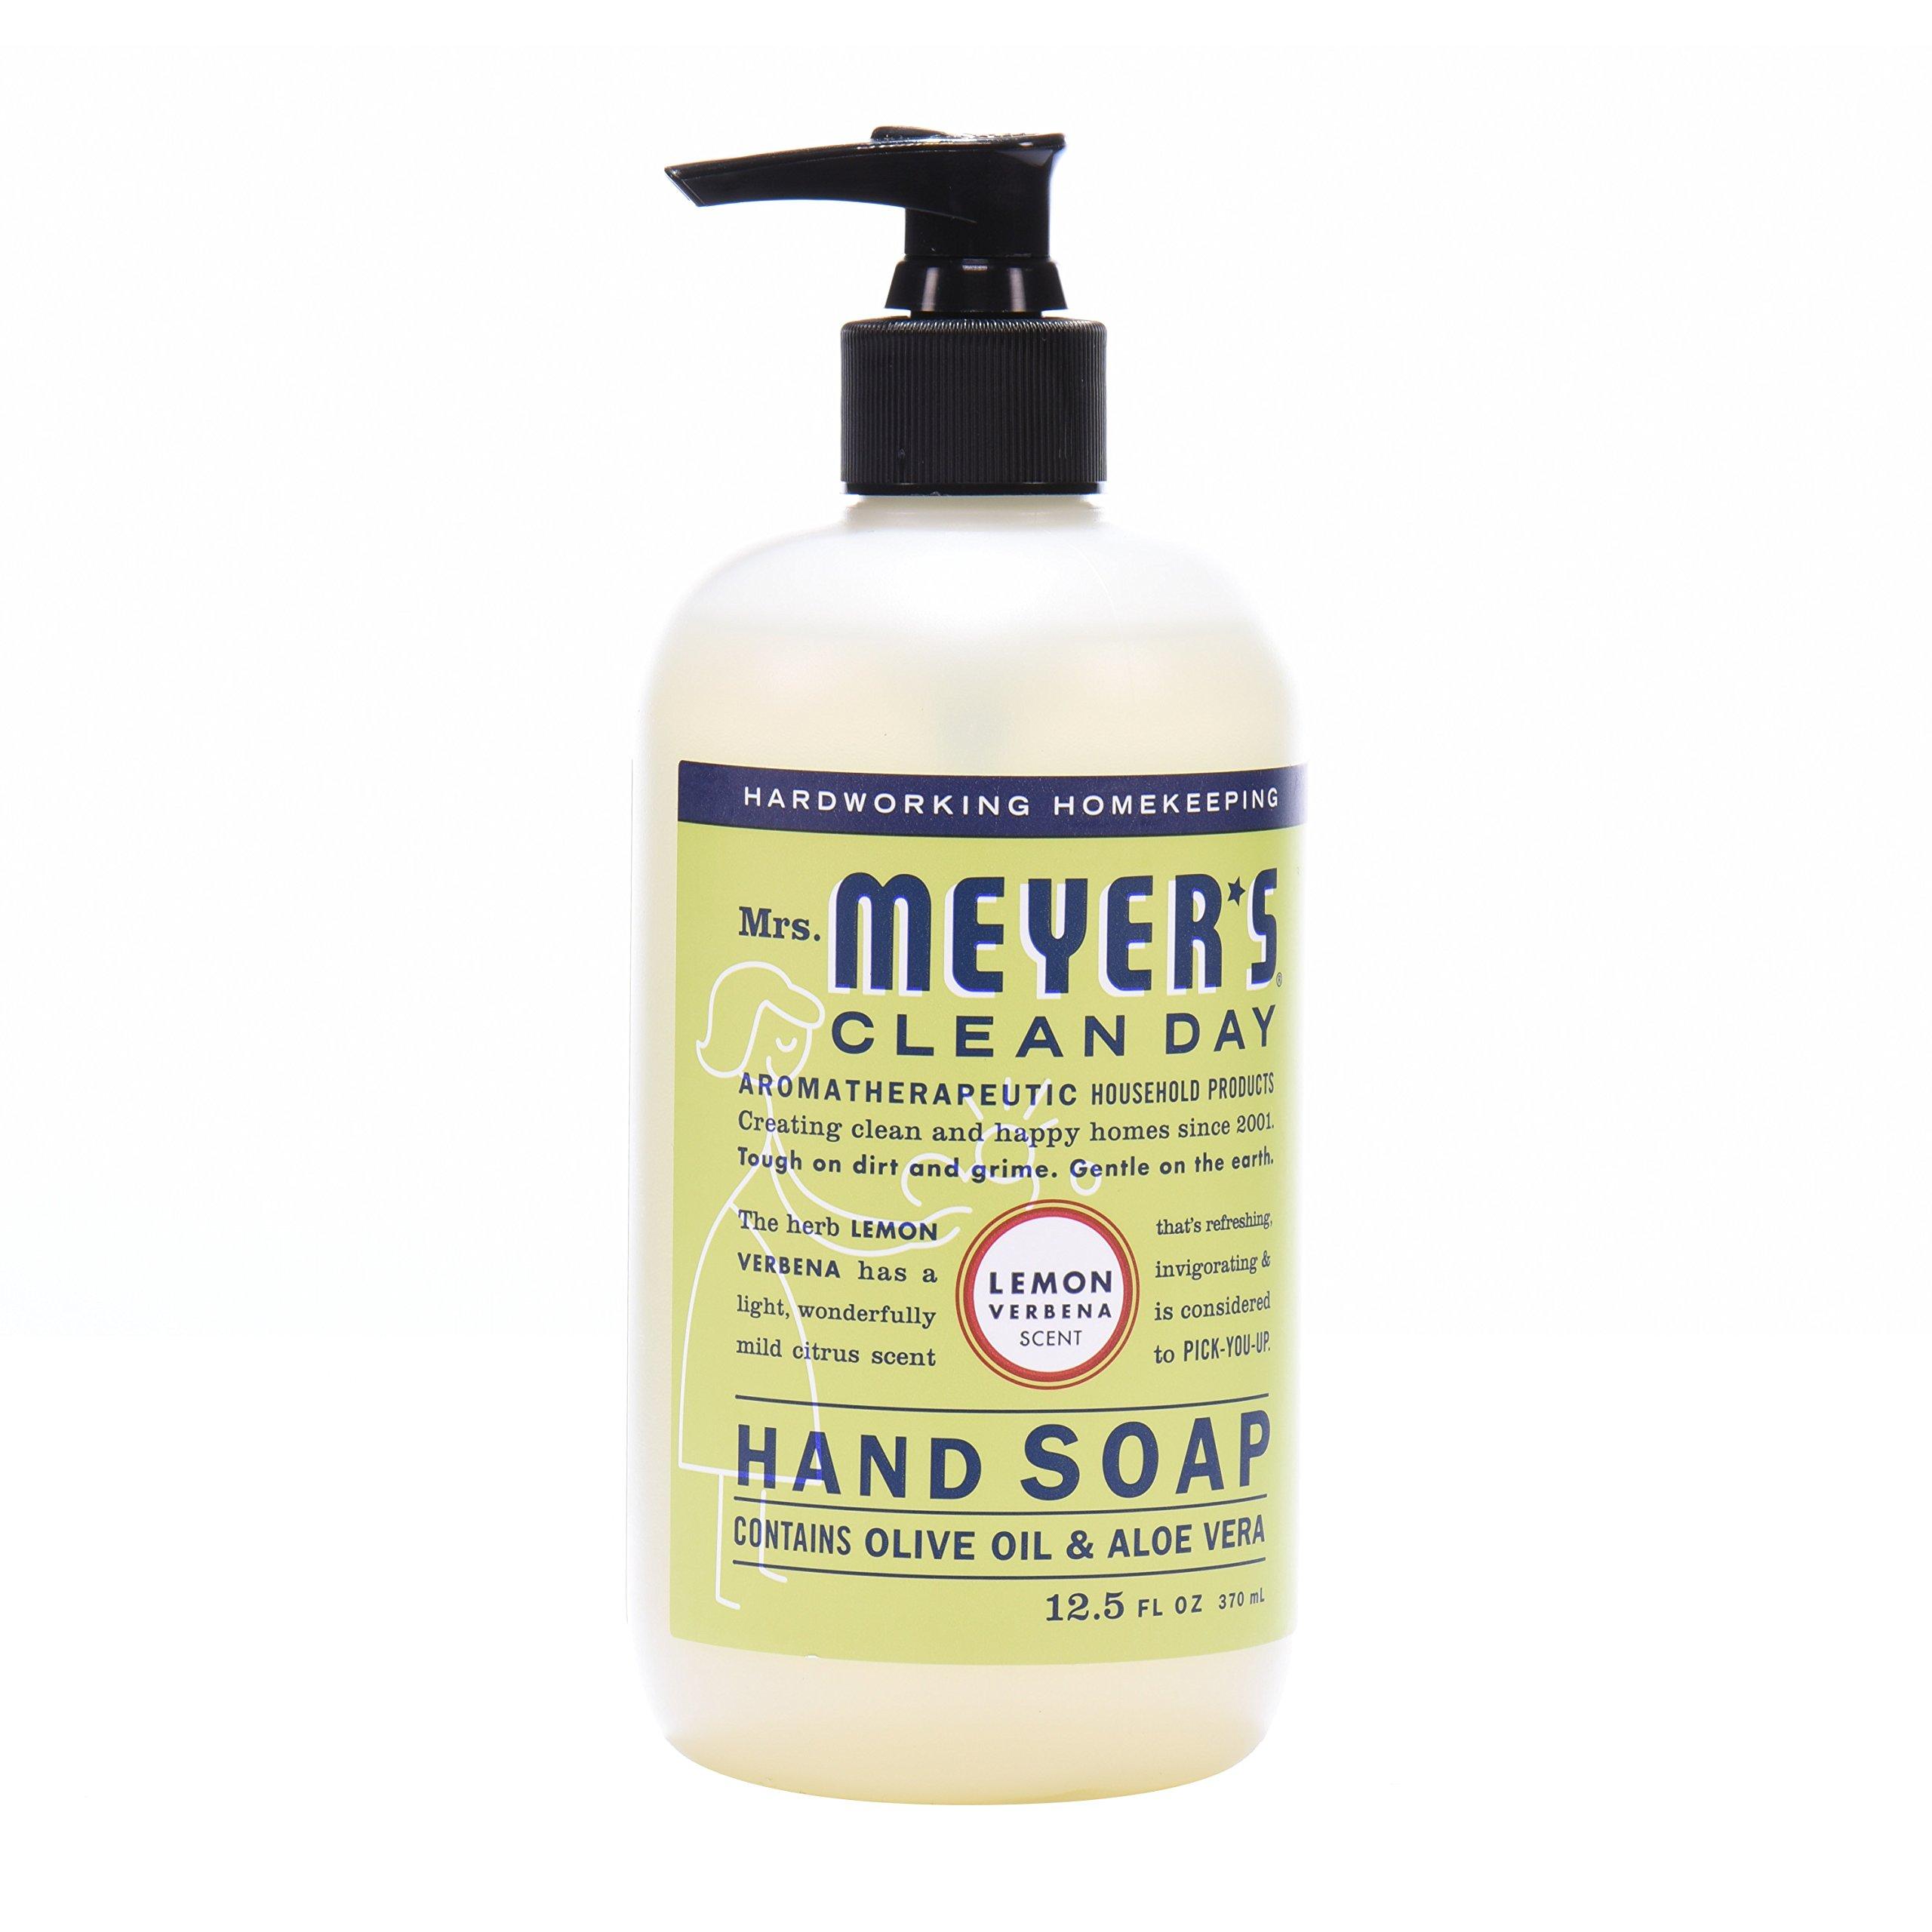 Mrs. Meyer´s Clean Day Hand Soap, Lemon Verbena, 12.5 fl oz, 3 ct by Mrs. Meyer's Clean Day (Image #2)